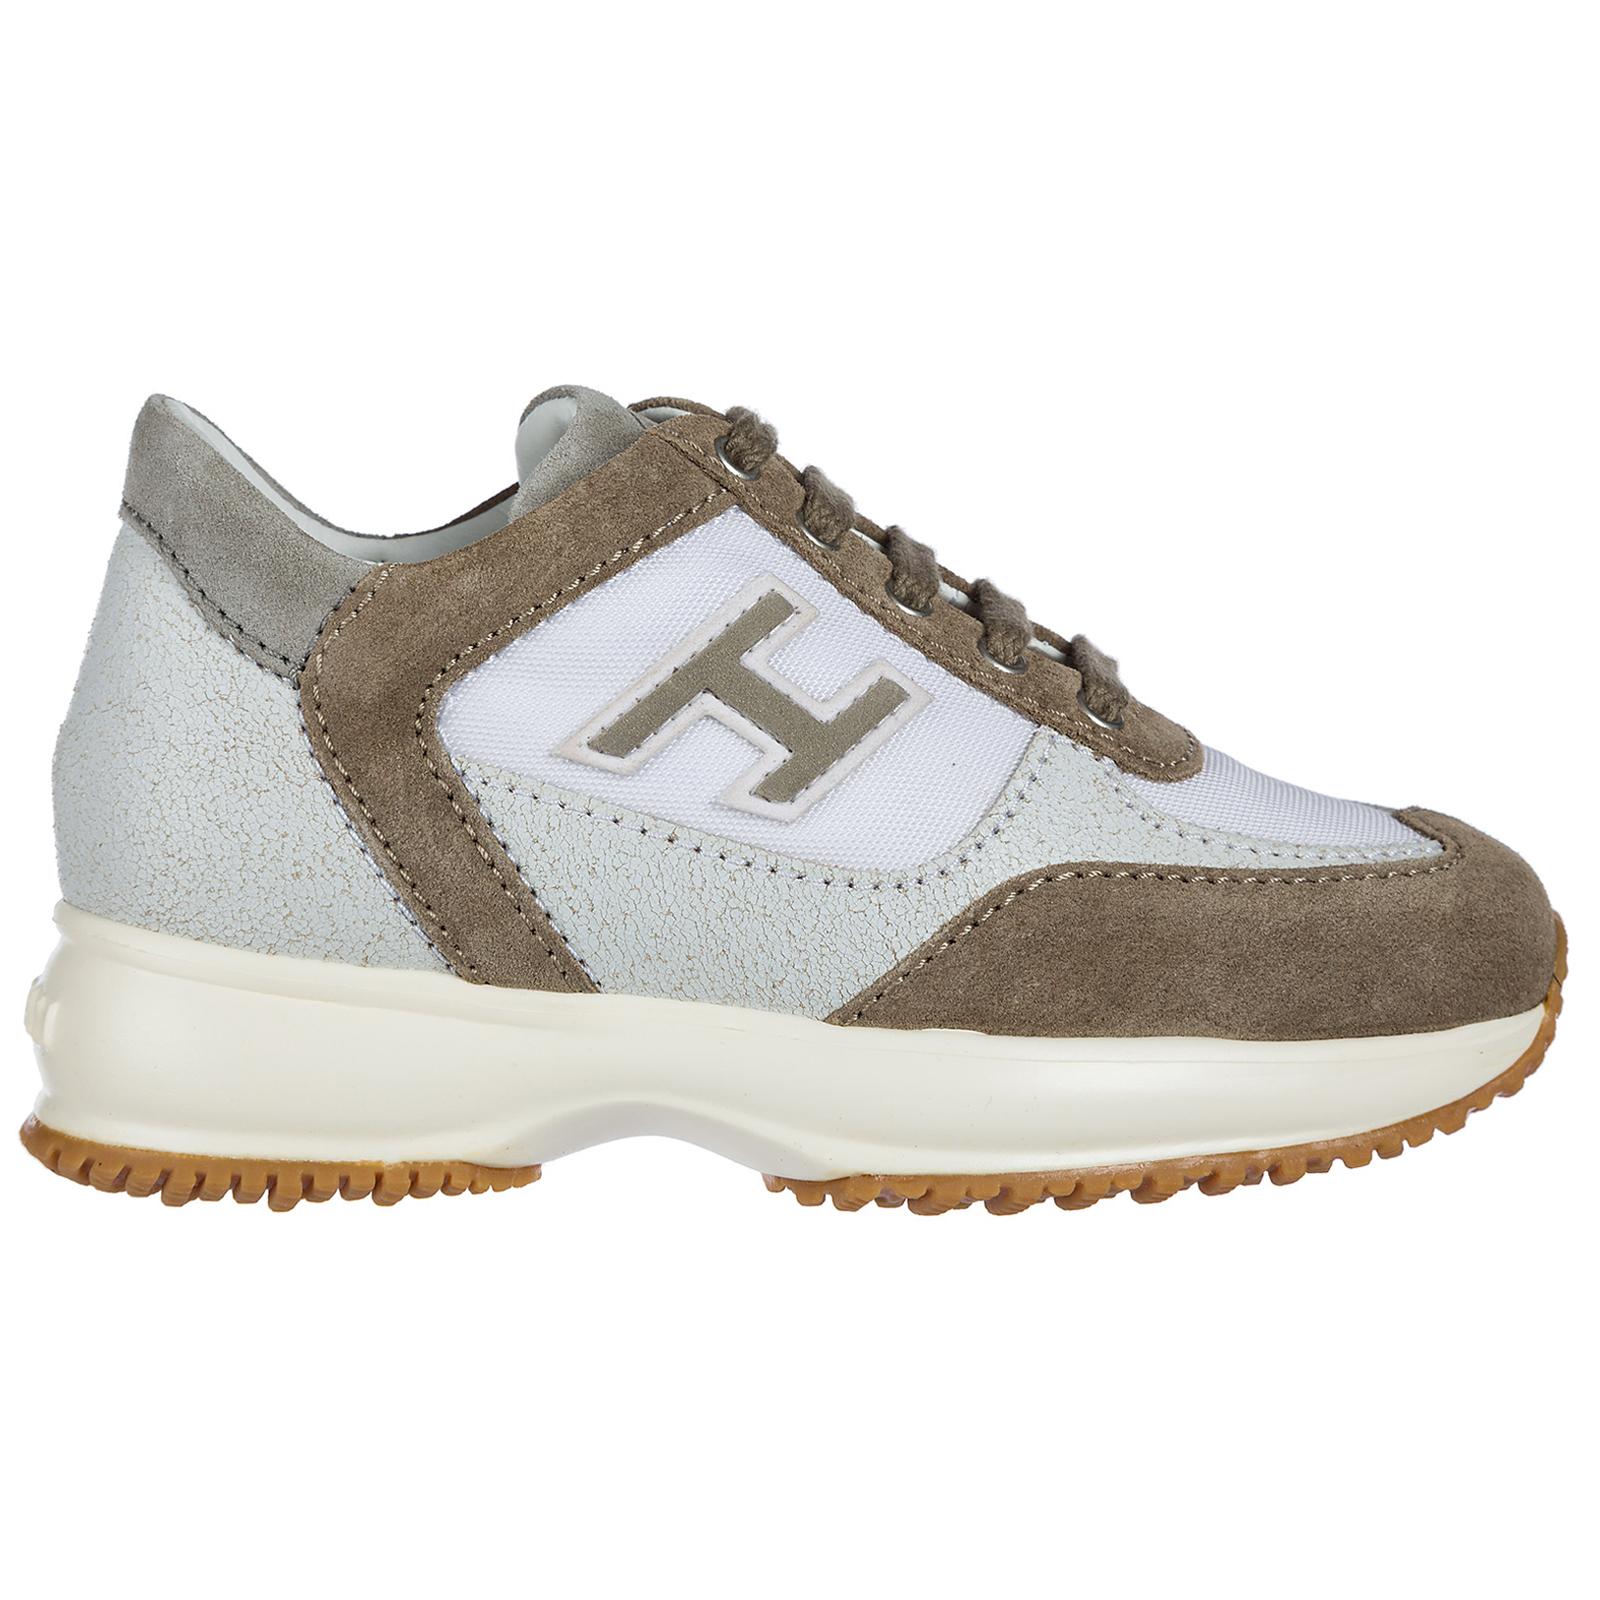 Hogan Boys shoes baby child sneakers camoscio interactive h flock c77aa48e6ef